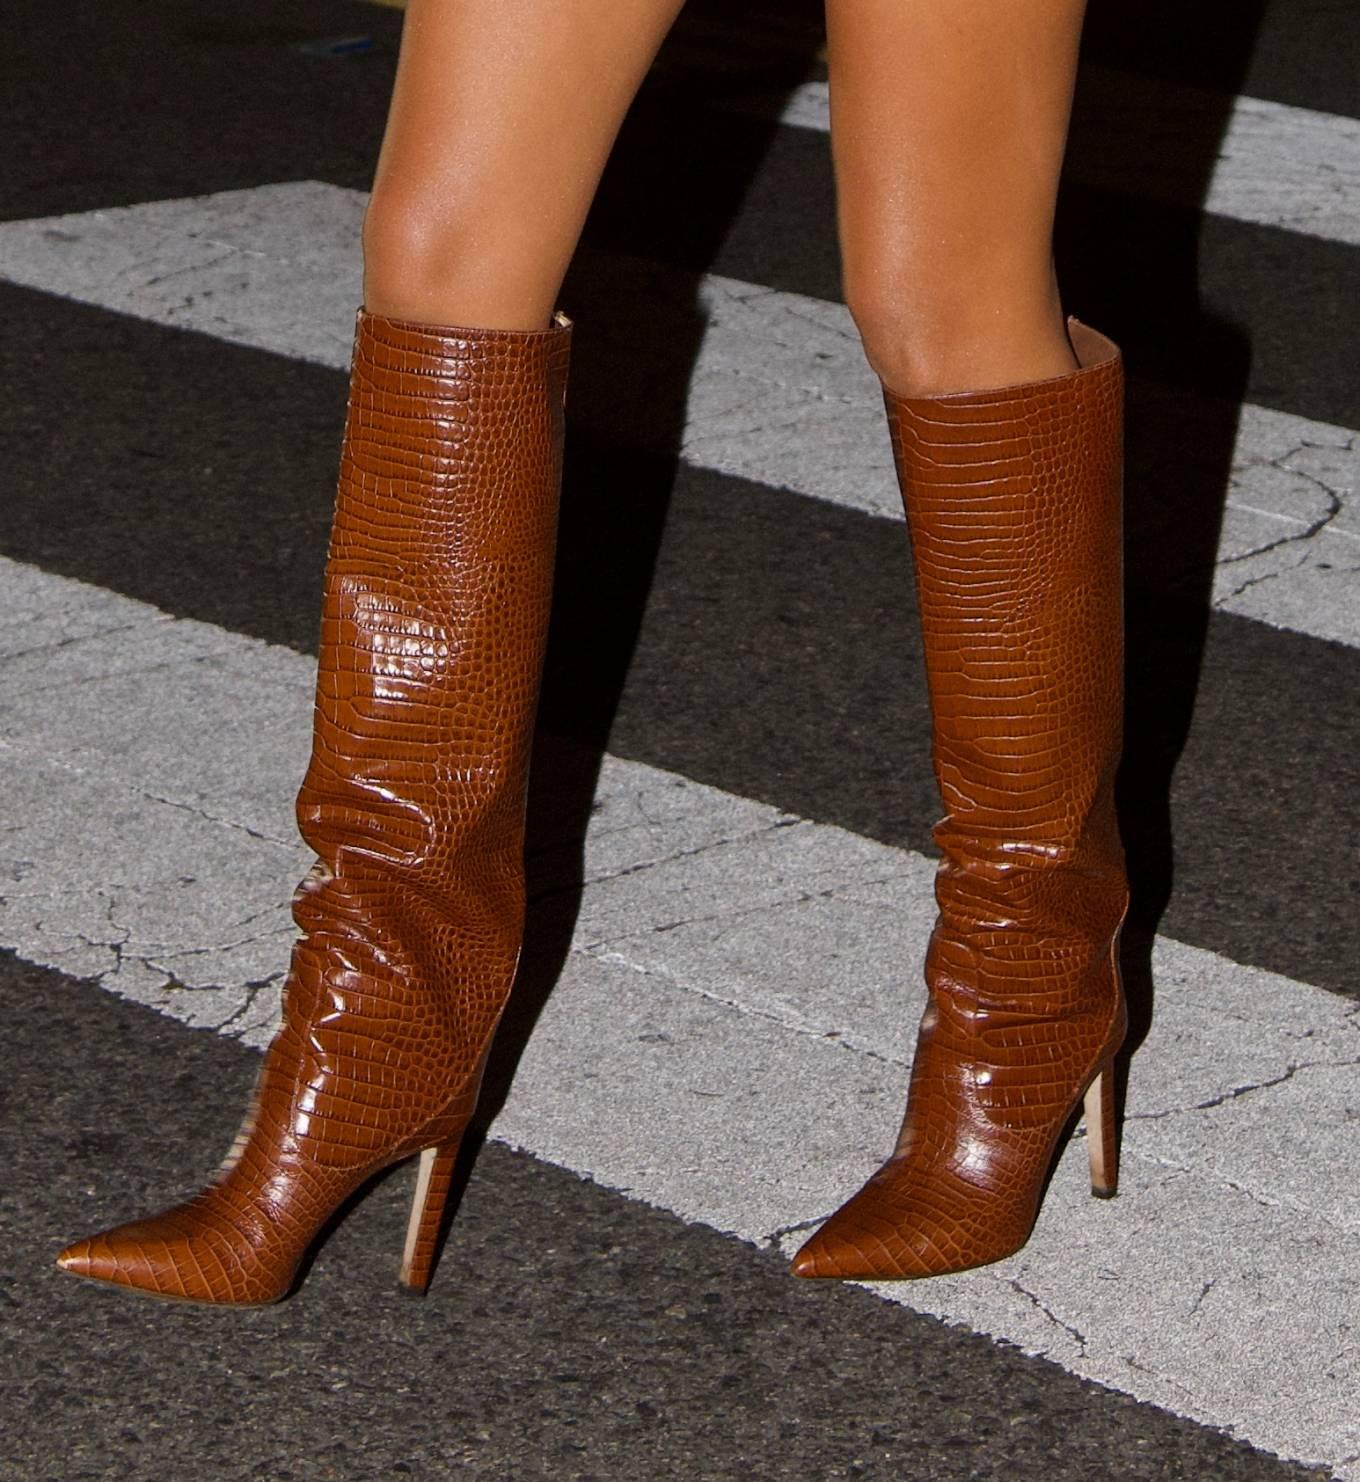 Olivia Culpo rocking sleek tan brown knee high boots by Jimmy Choo with high heel and Crocodile effect